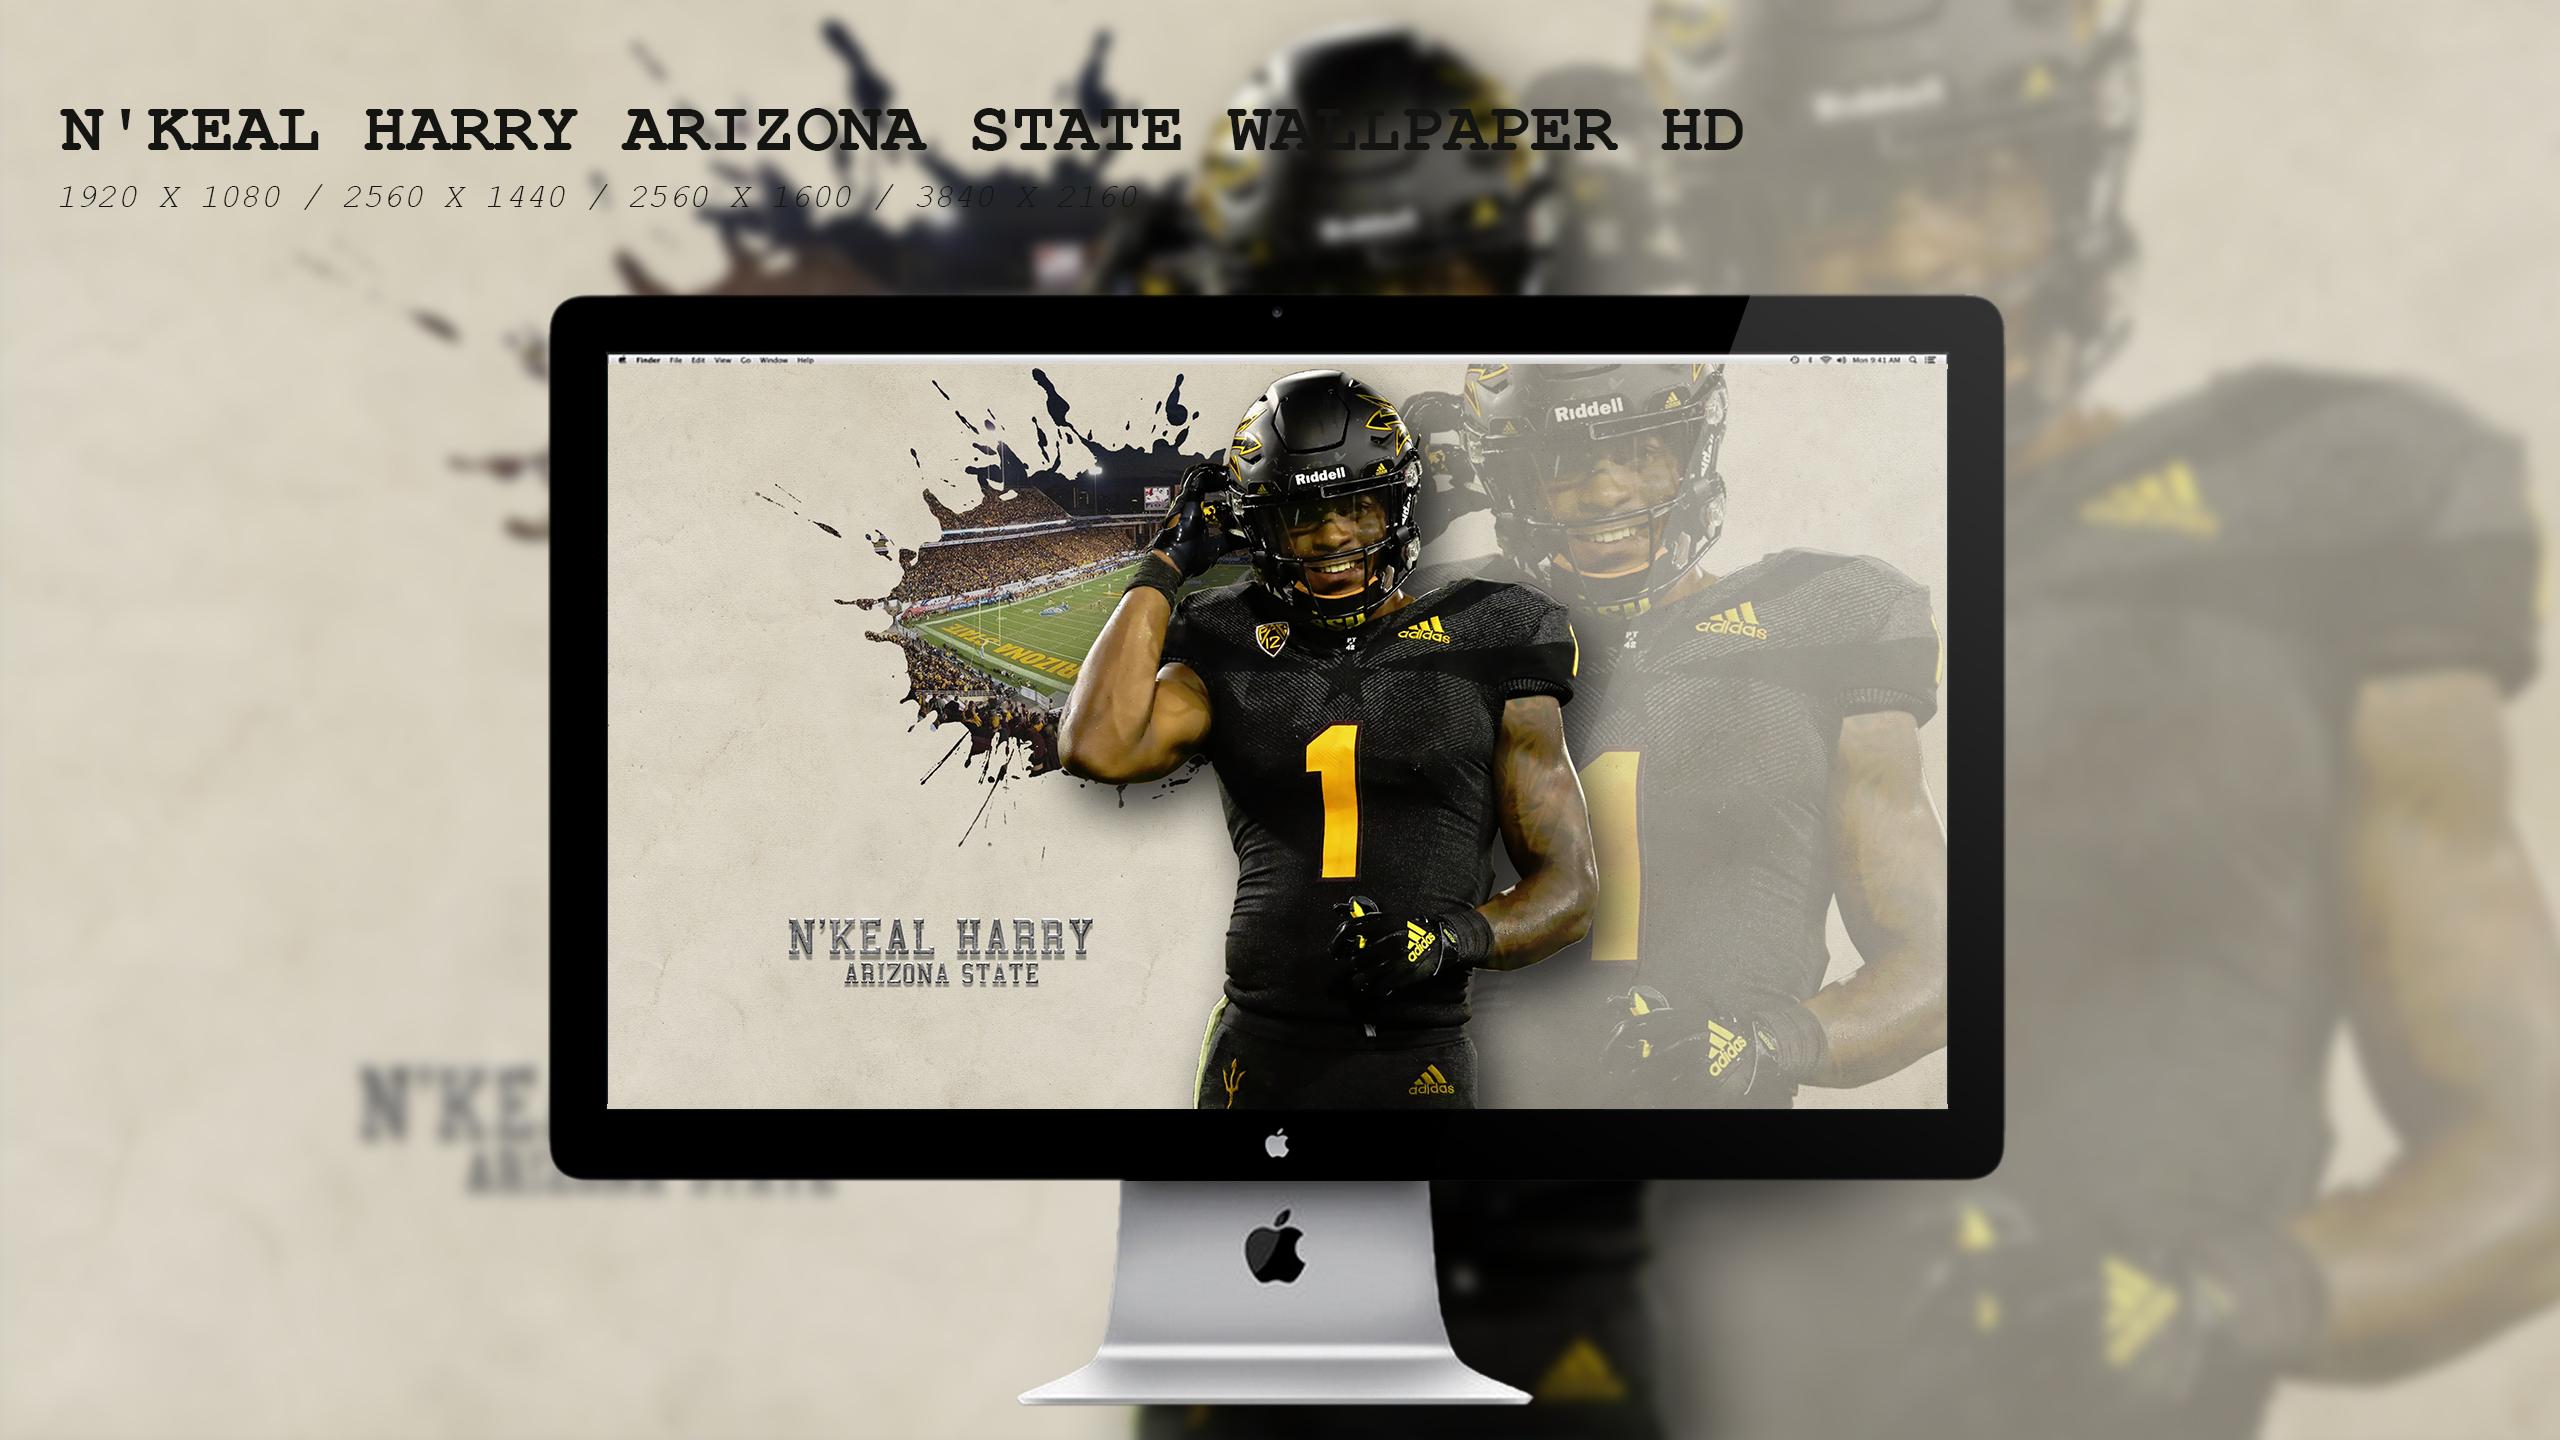 N'Keal Harry Arizona State Wallpaper HD